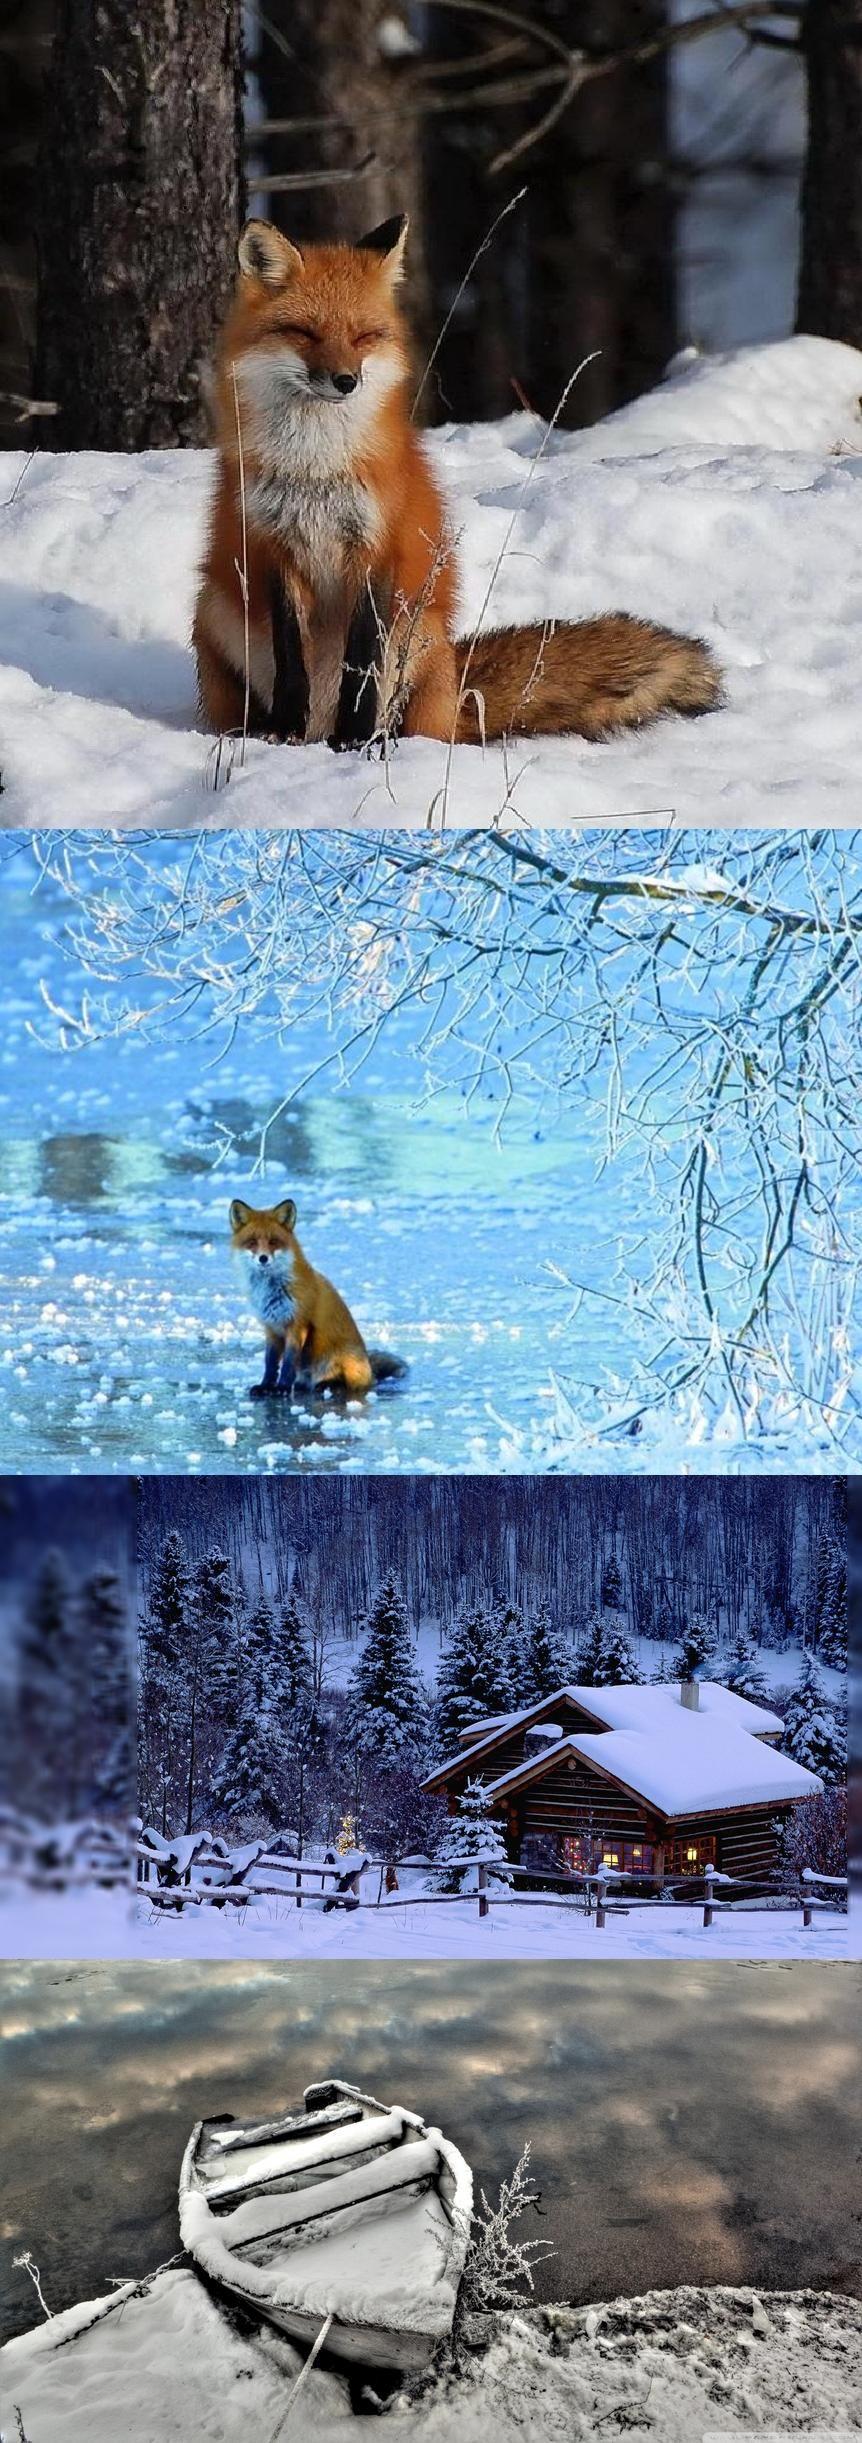 Fox in winter winter squirrel